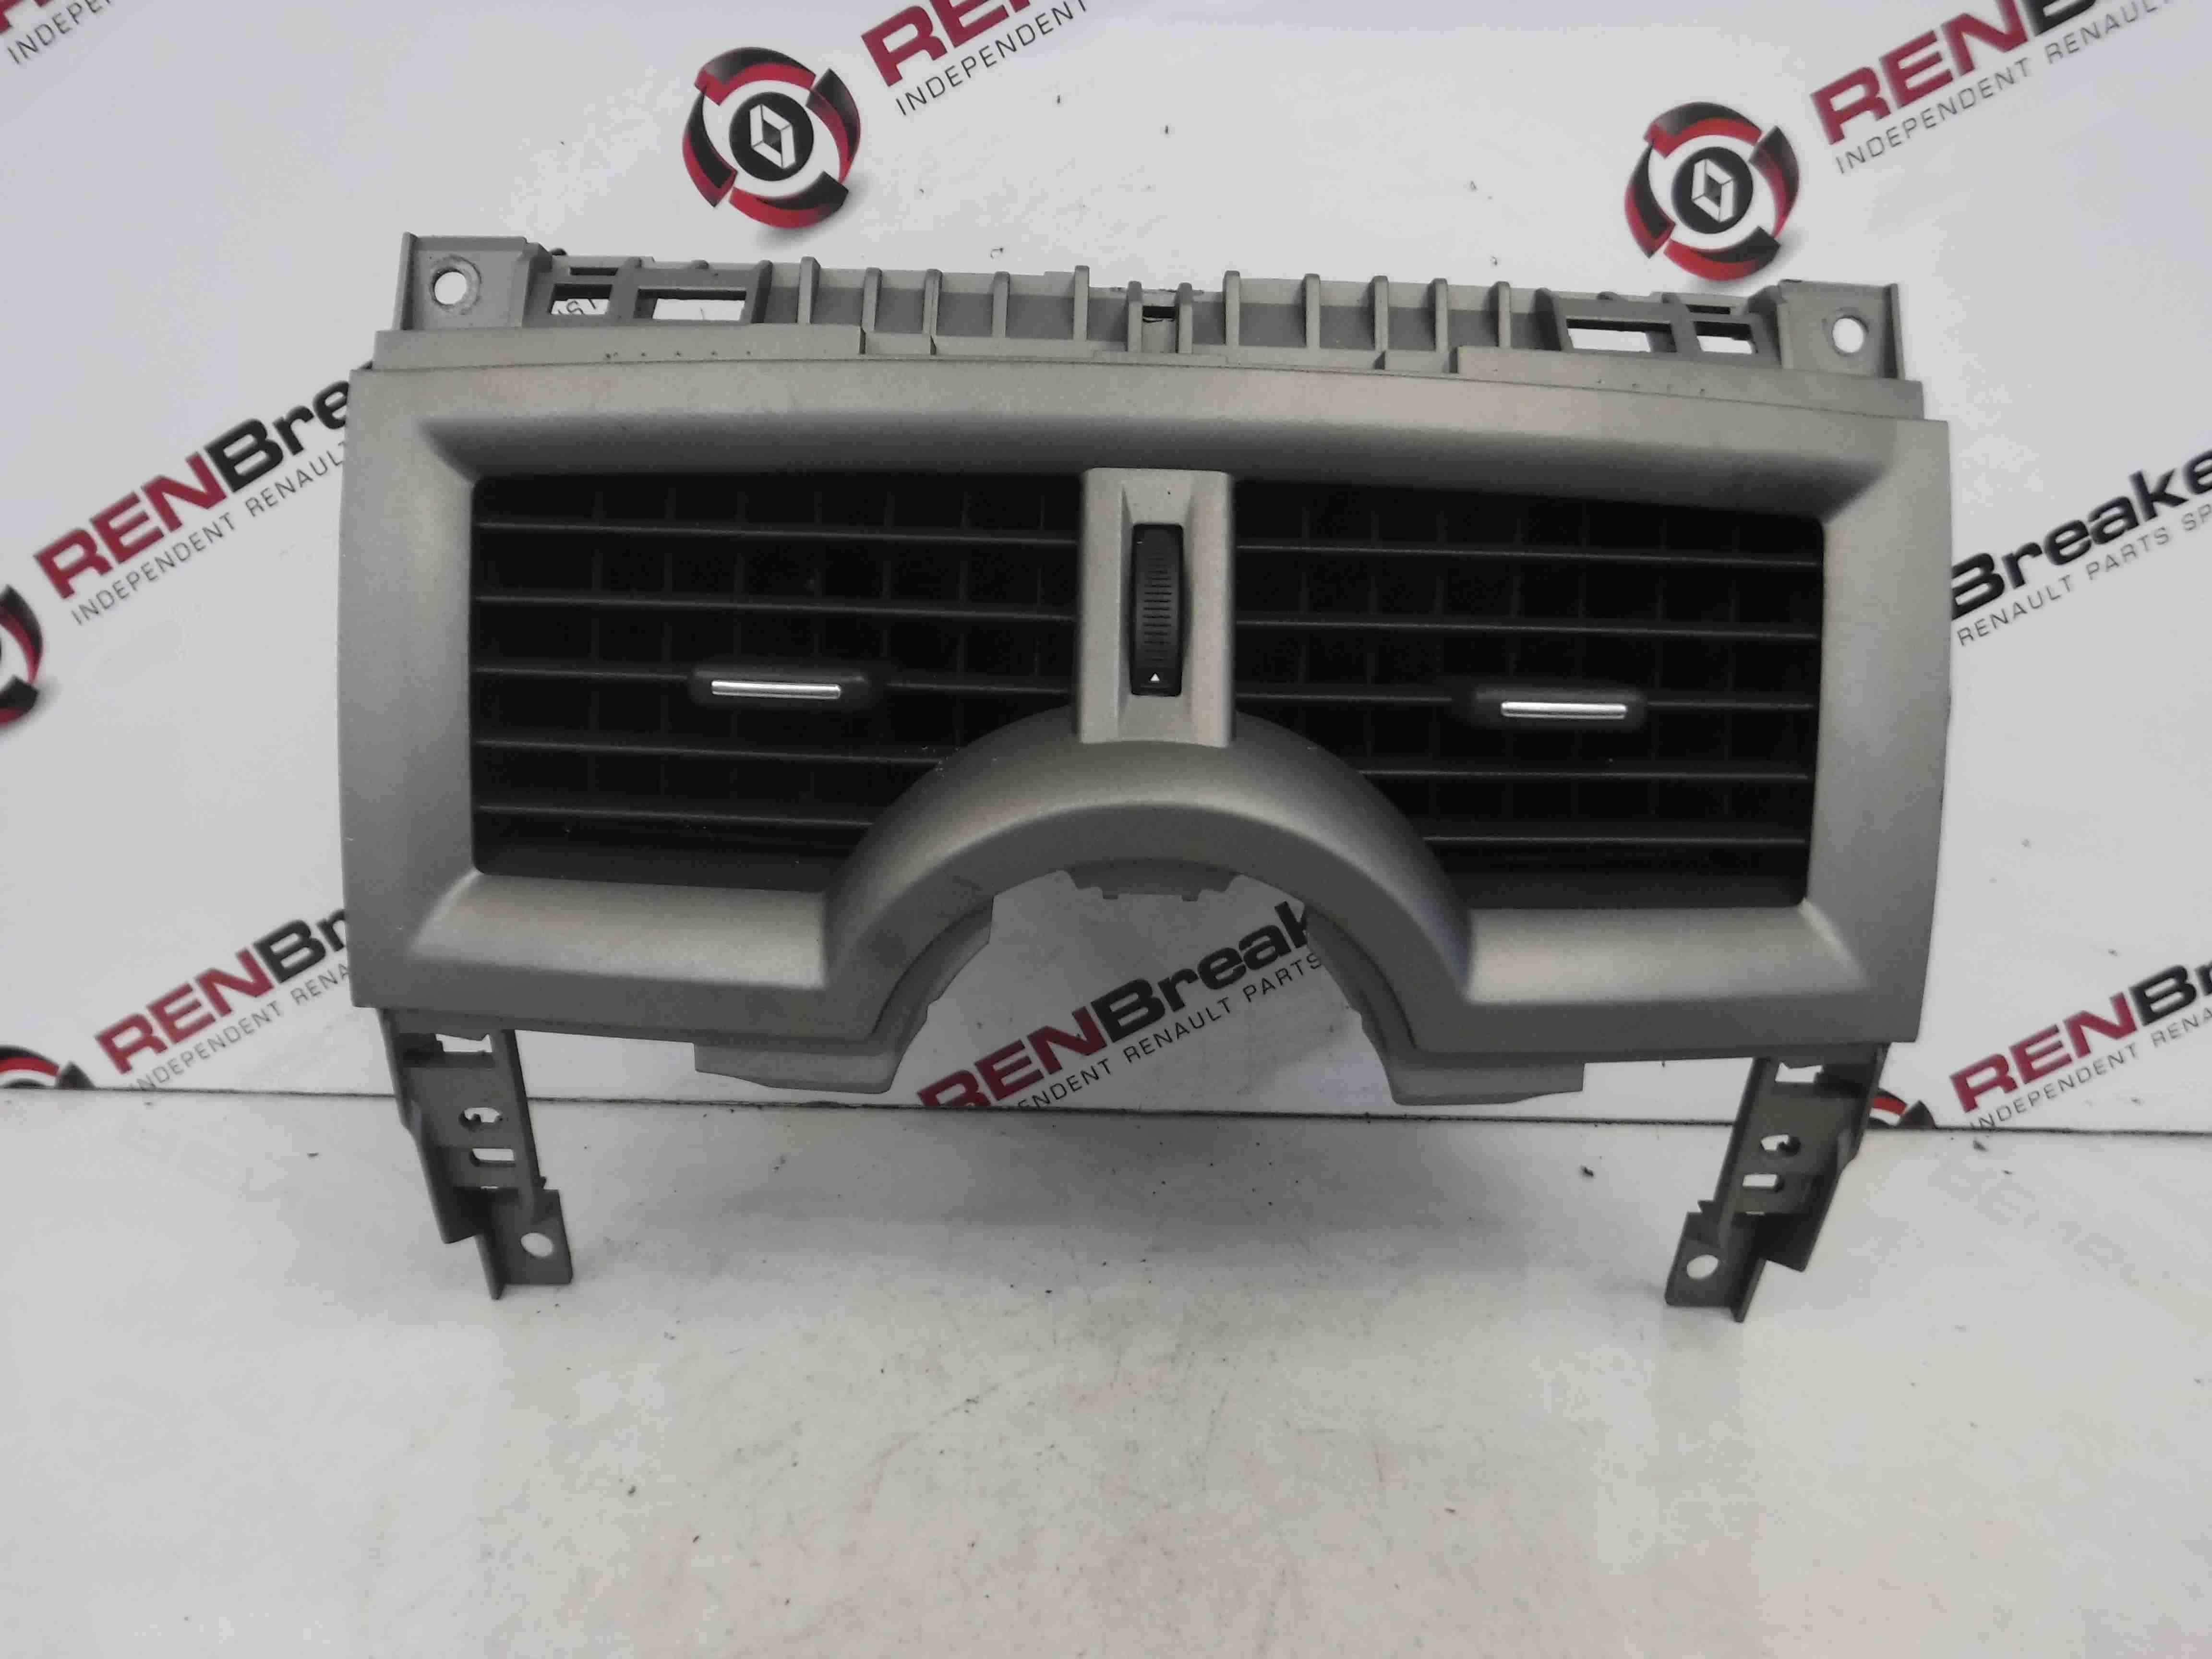 Renault Megane Convertible 2002-2008 Centre Heater Vents Silver